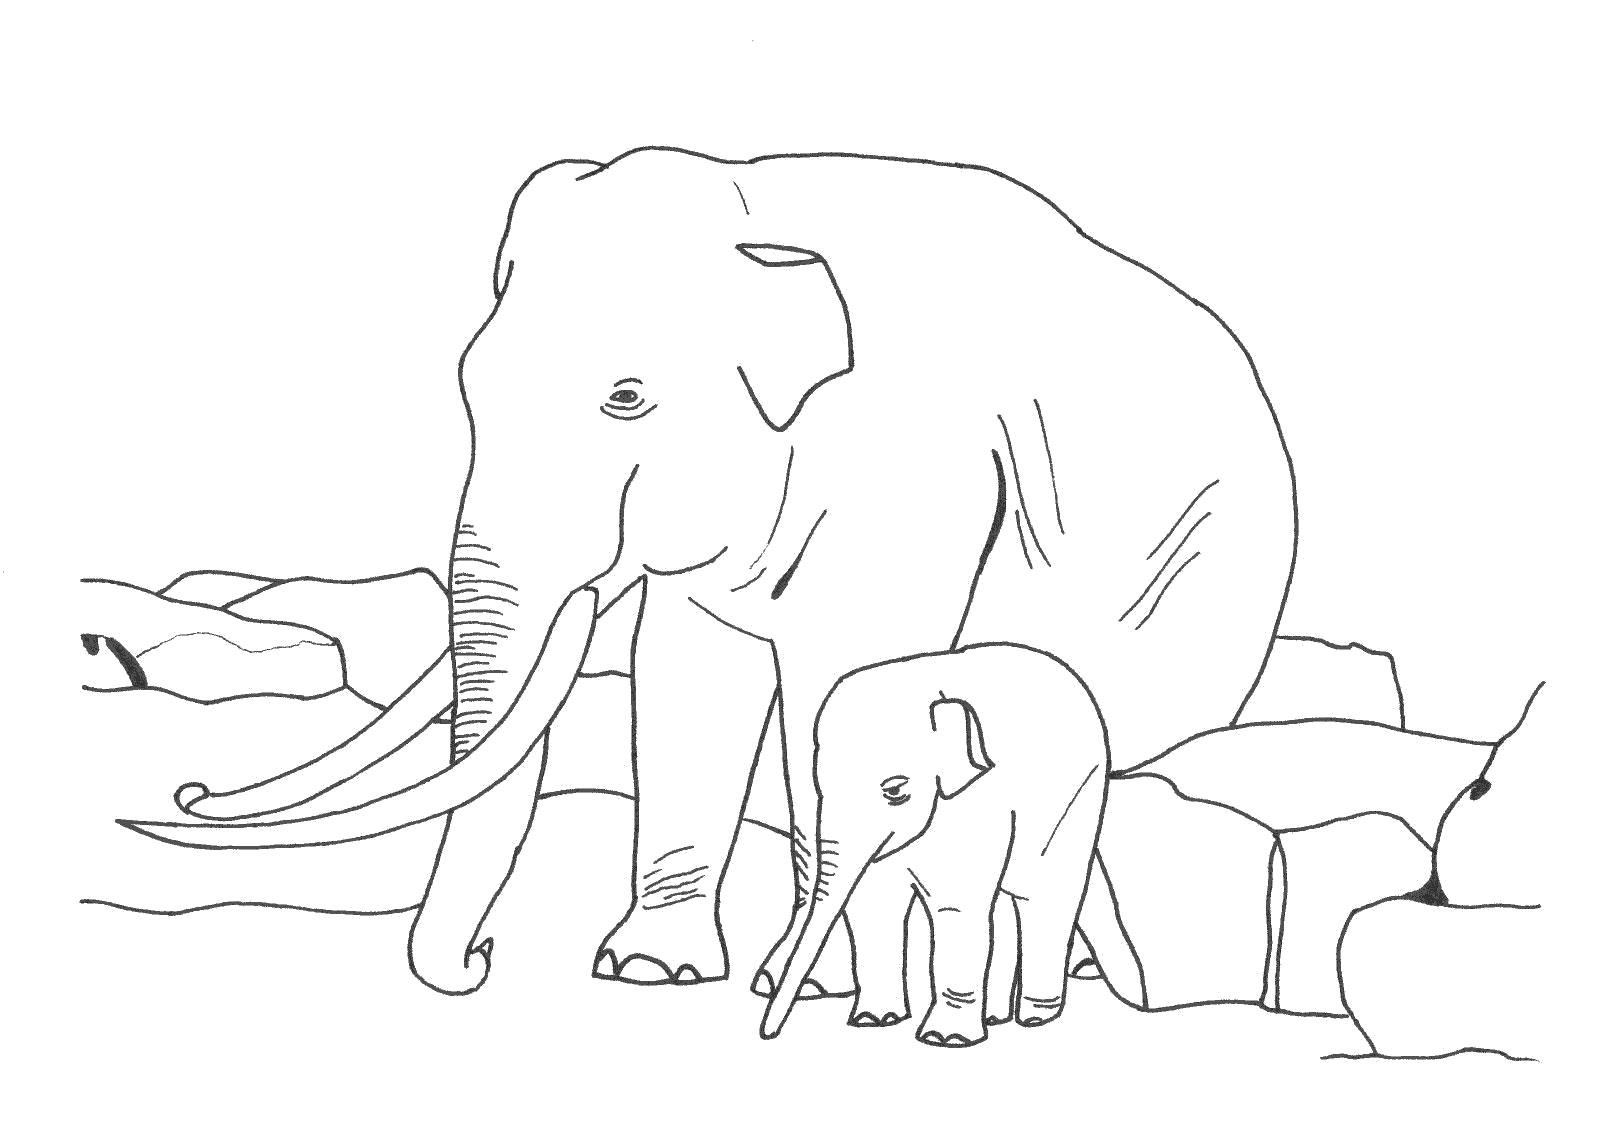 Картинки раскраски слонов